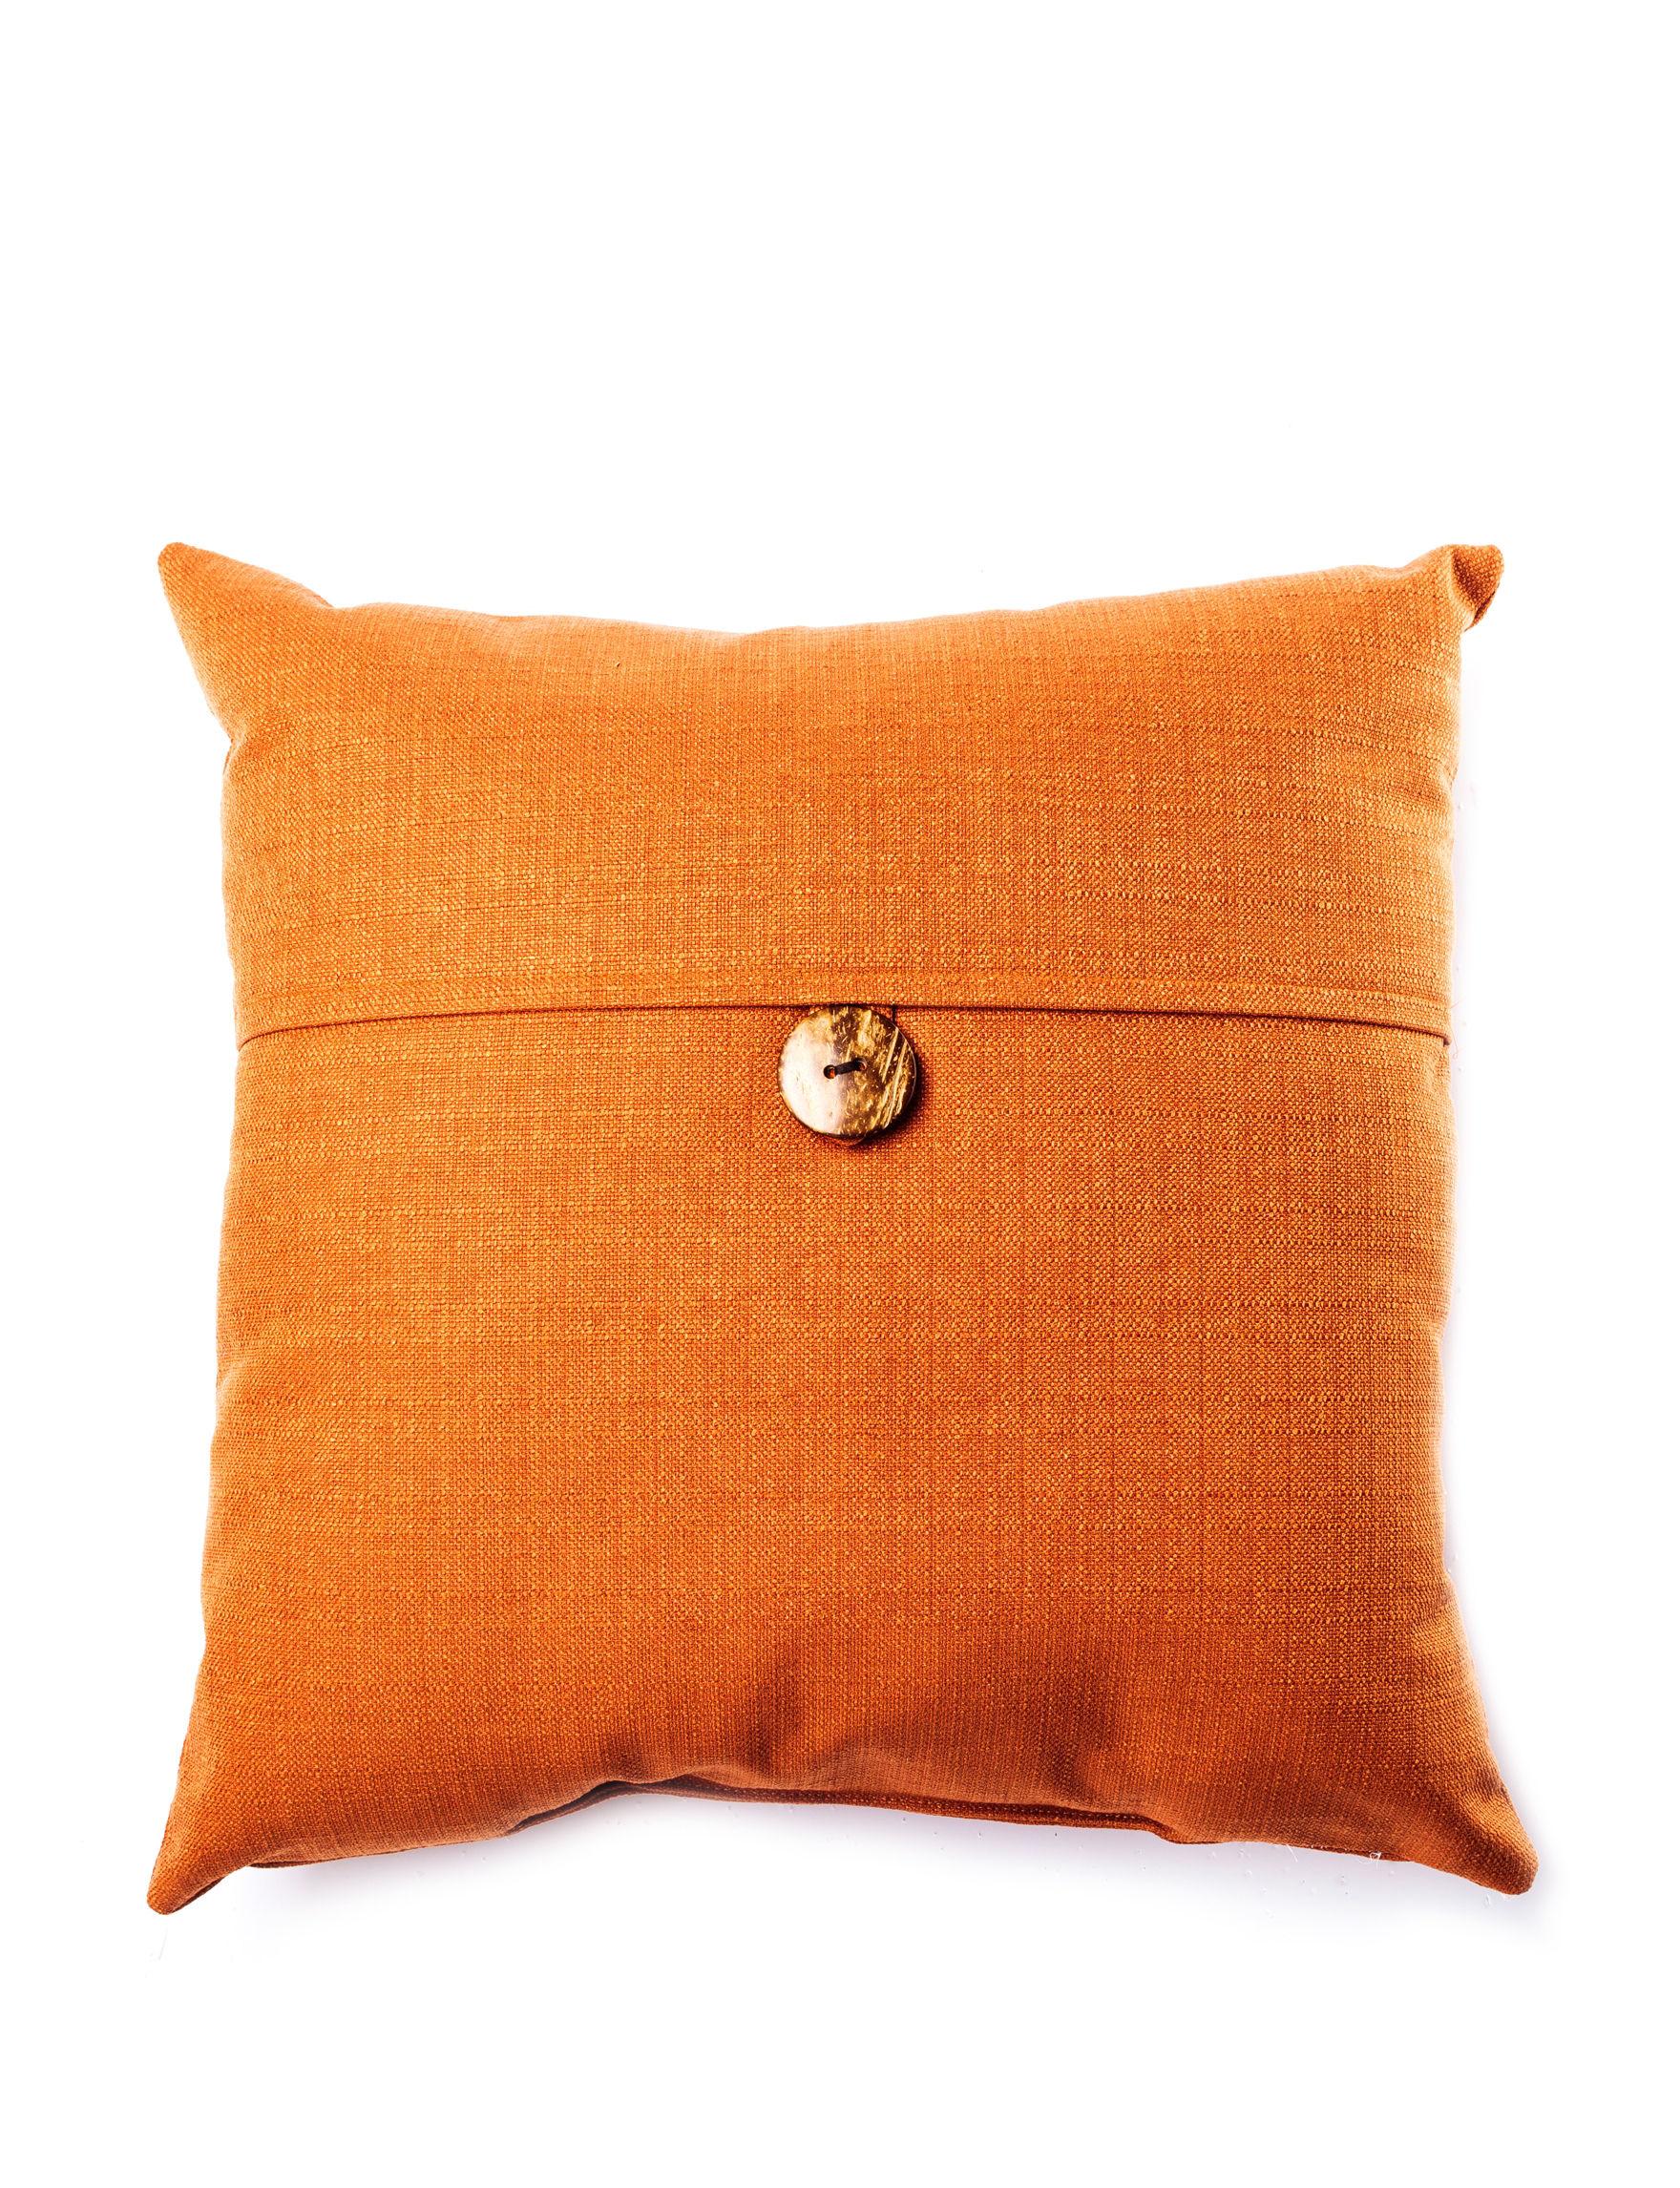 Home Fashions International Tangerine Decorative Pillows